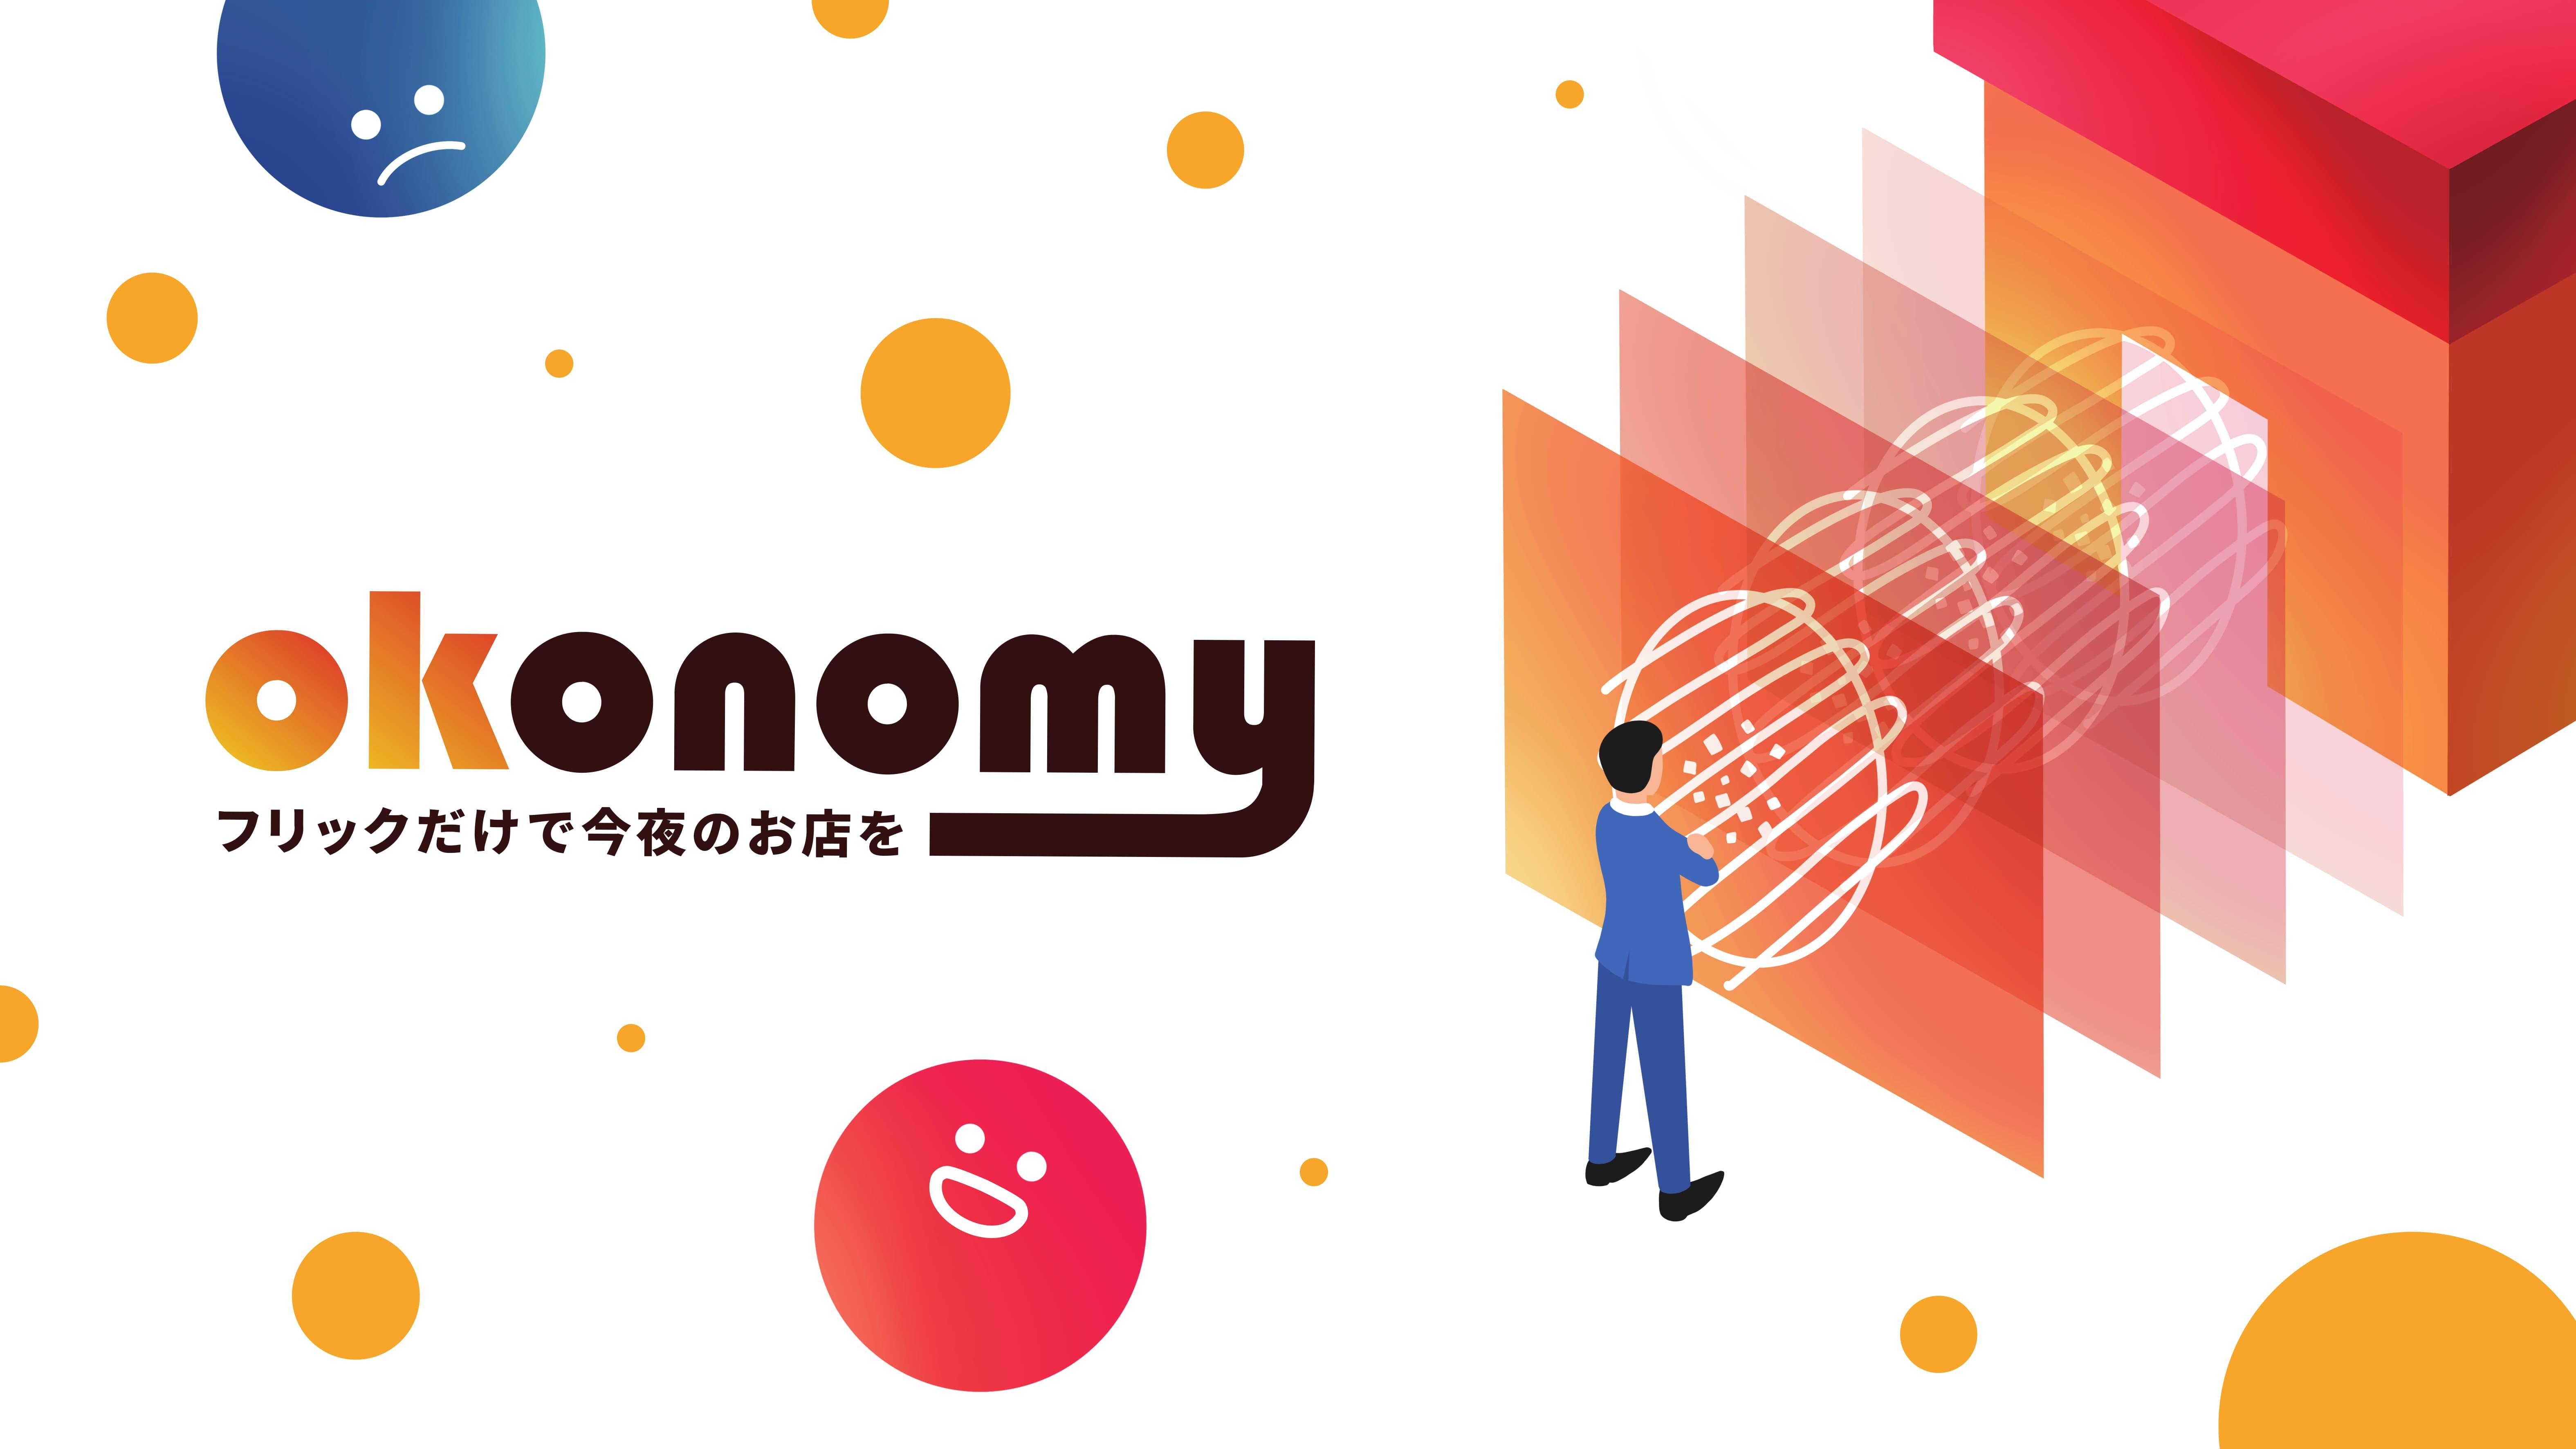 okonomyパワー-01.jpg